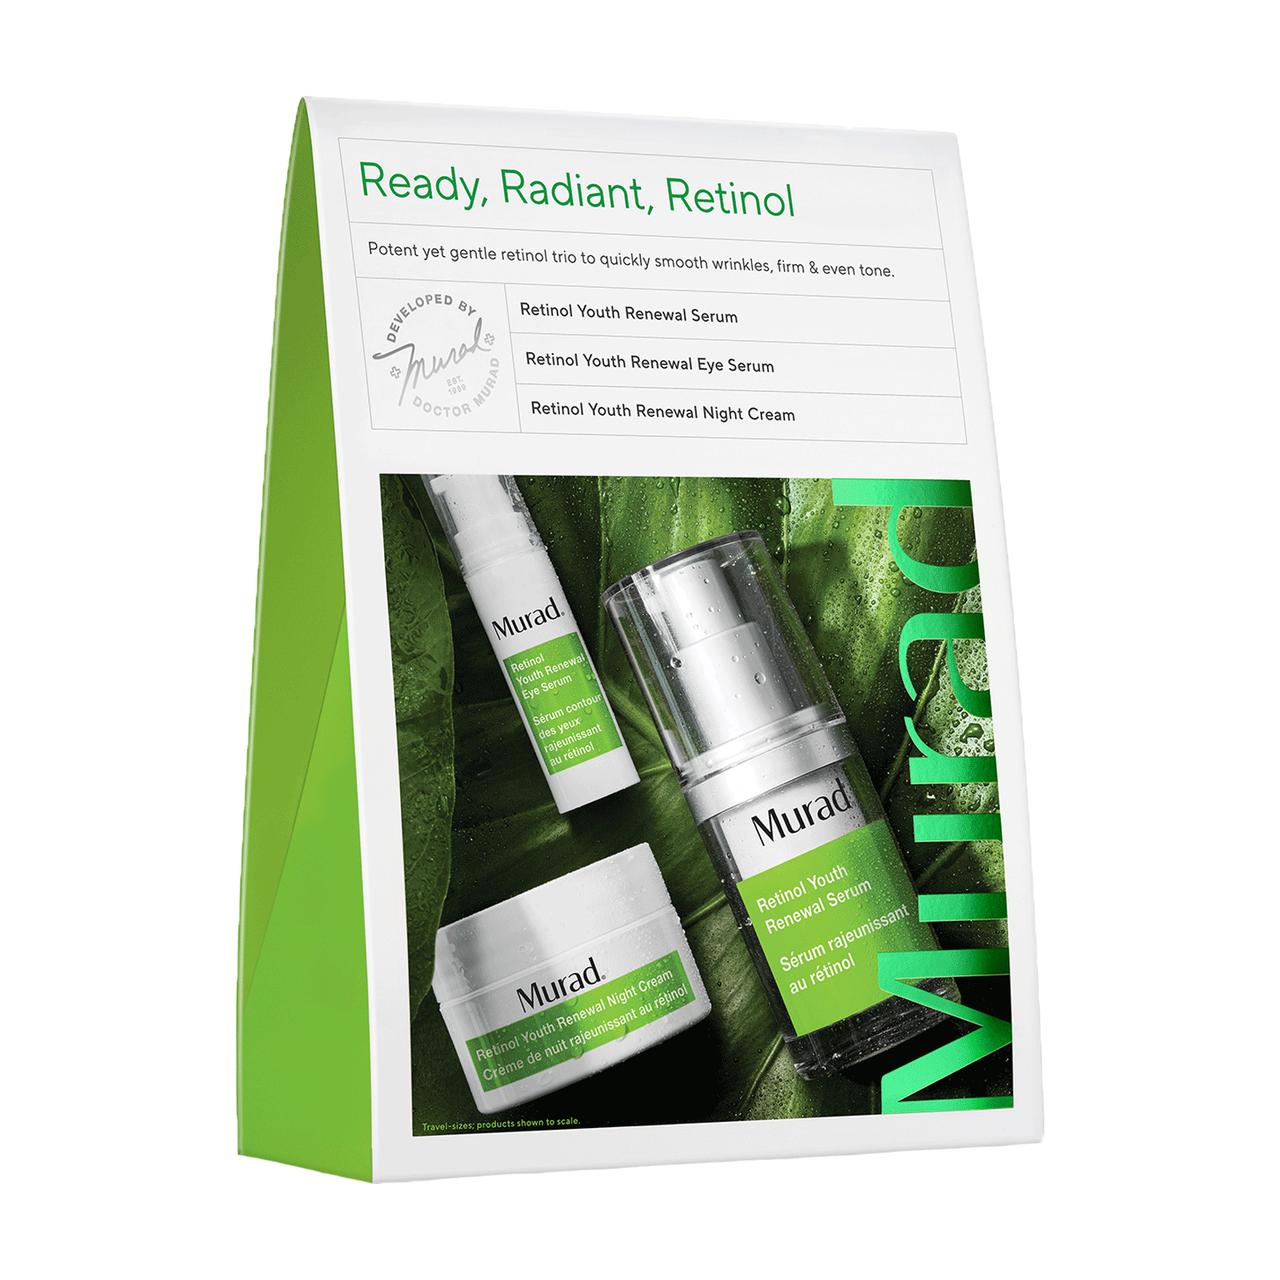 Murad Ready Radiant Retinol Kit - $76.40